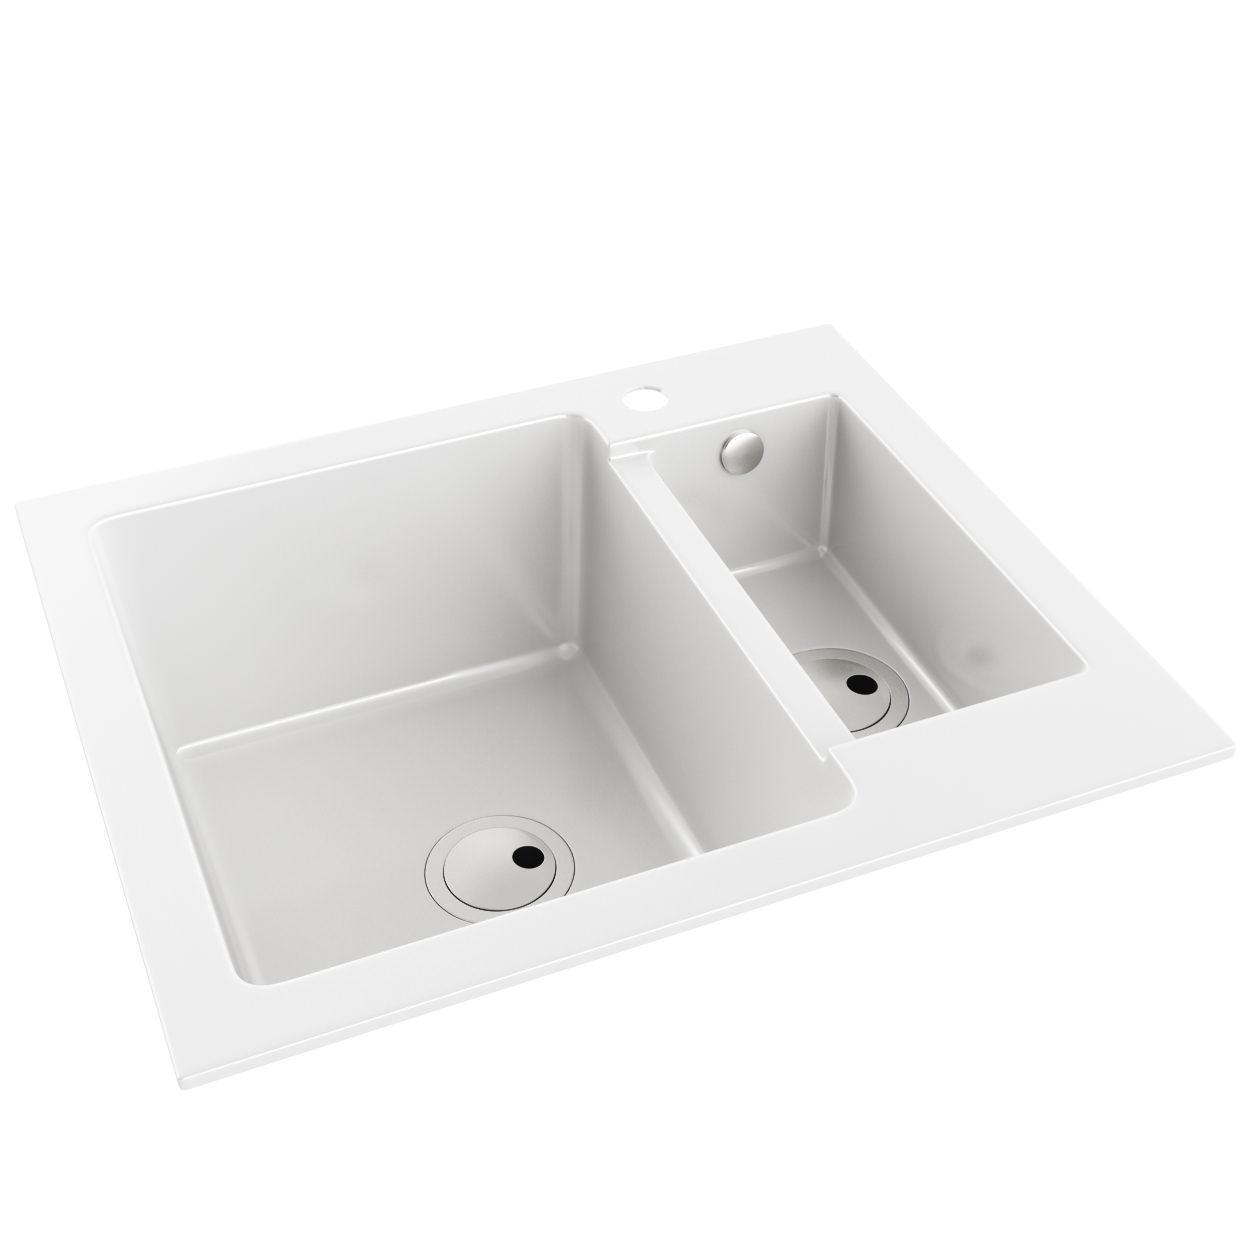 Abode Zero 1.5 Bowl Granite Kitchen Sink Without Drainer | AW3105